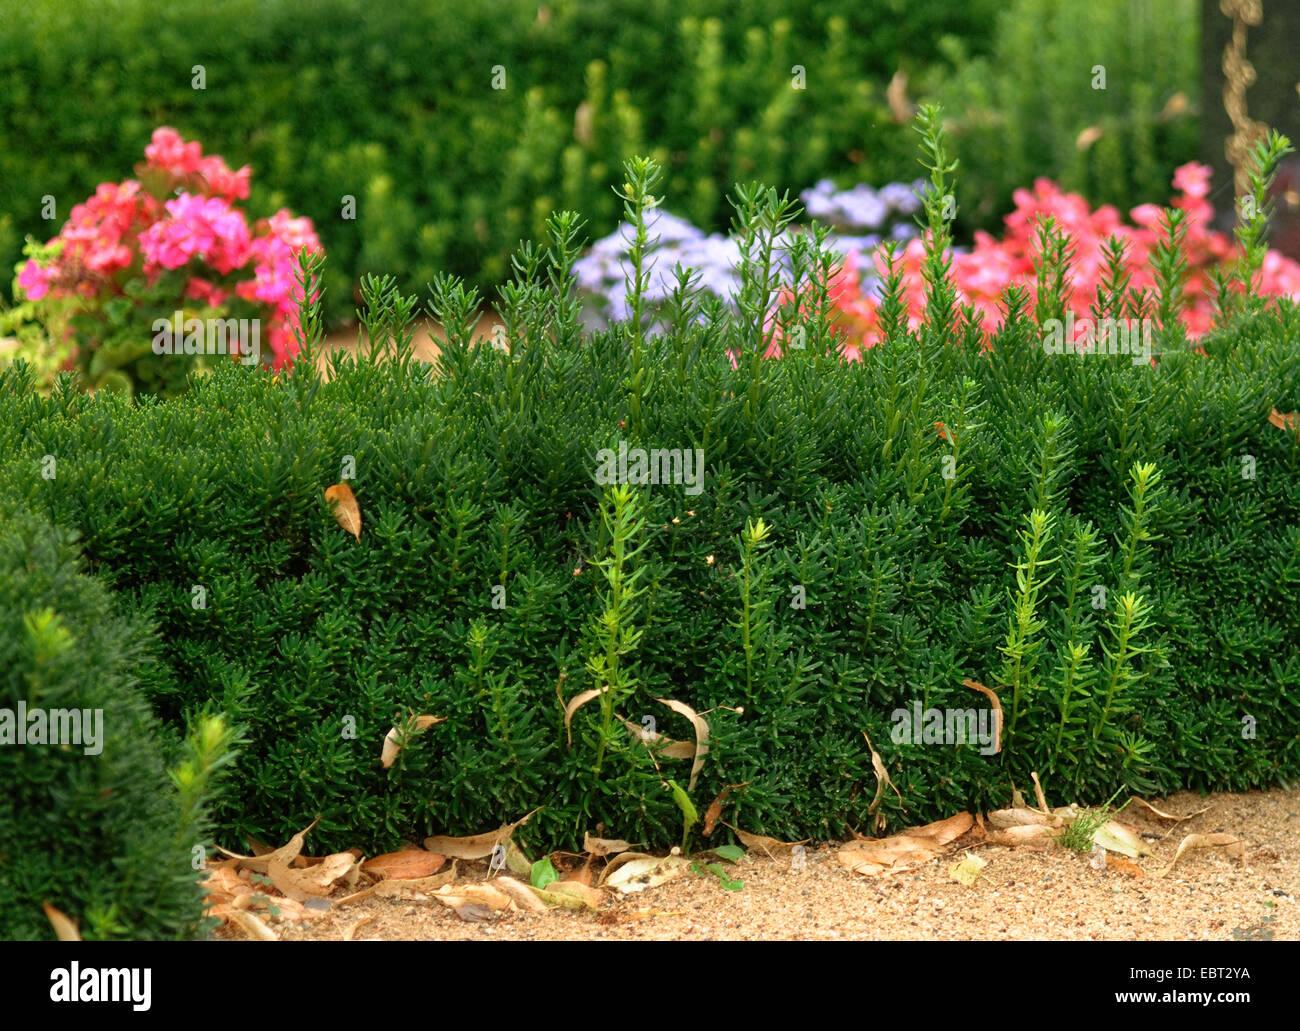 Japanese yew, pyramidal yew (Taxus cuspidata), as hedge - Stock Image